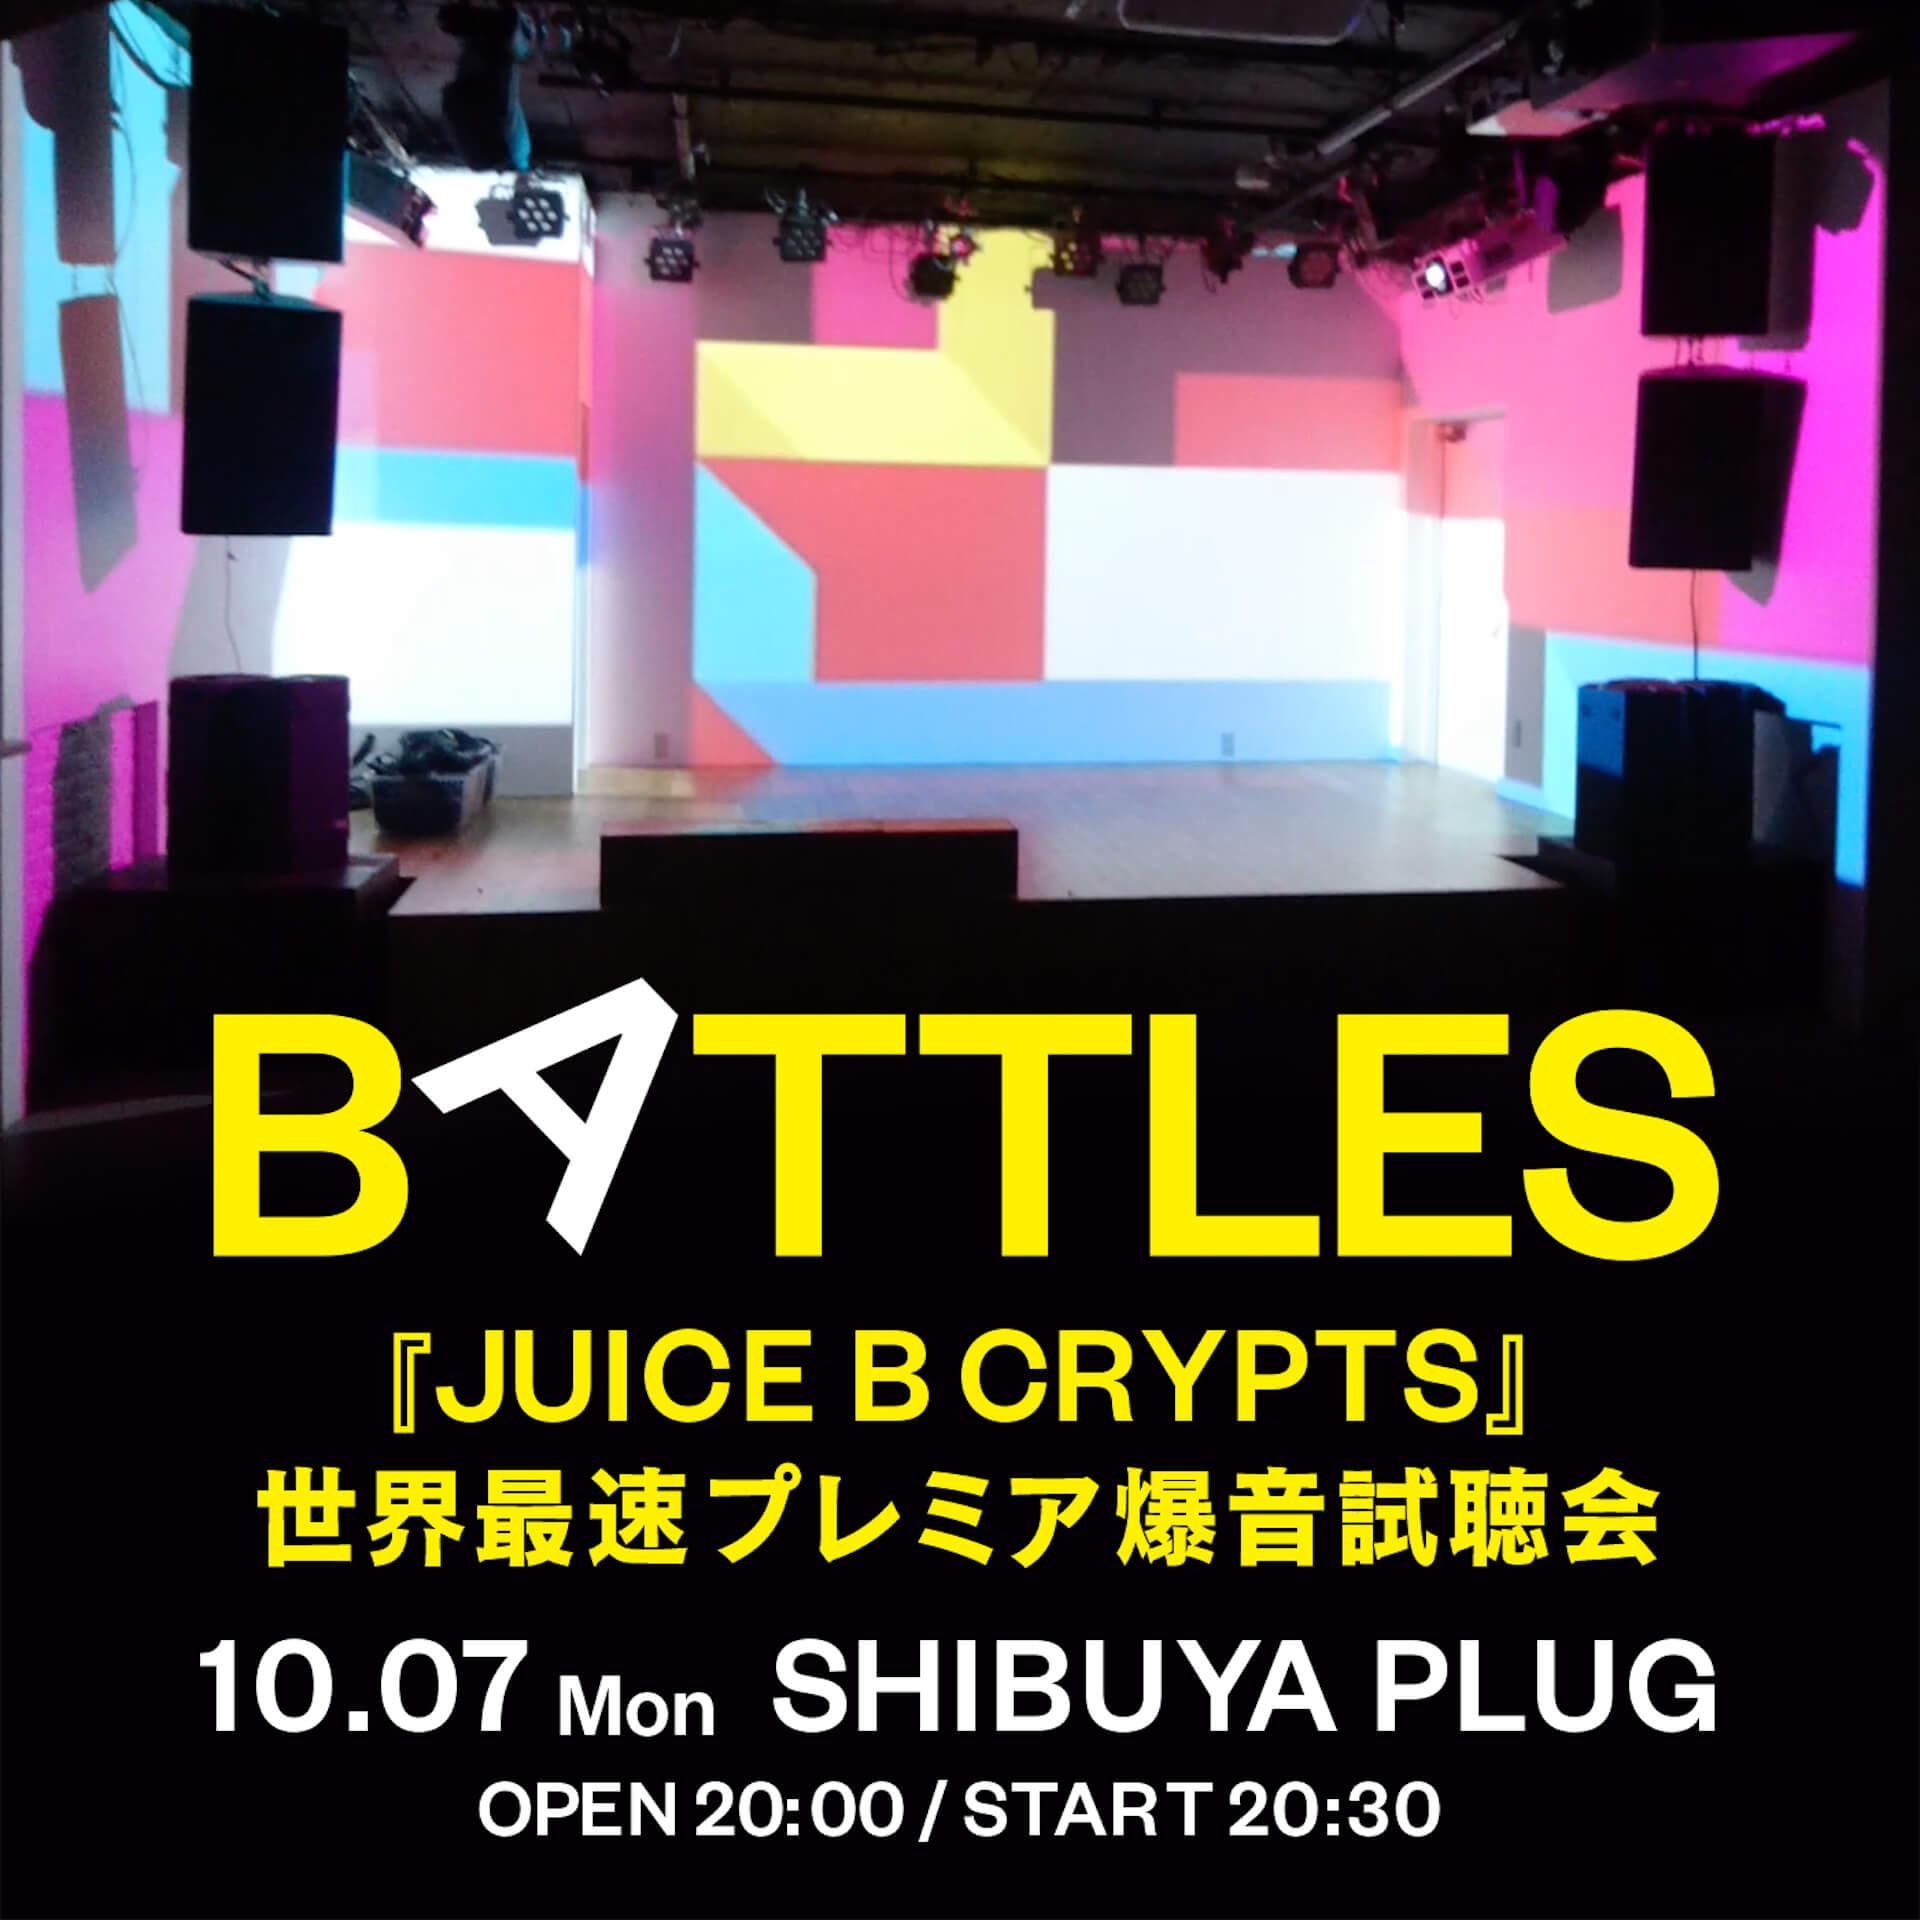 BATTLES最新アルバムの世界最速プレミア爆音試聴会の開催が決定!全国ツアーチケットも発売中 music191001_battles_1